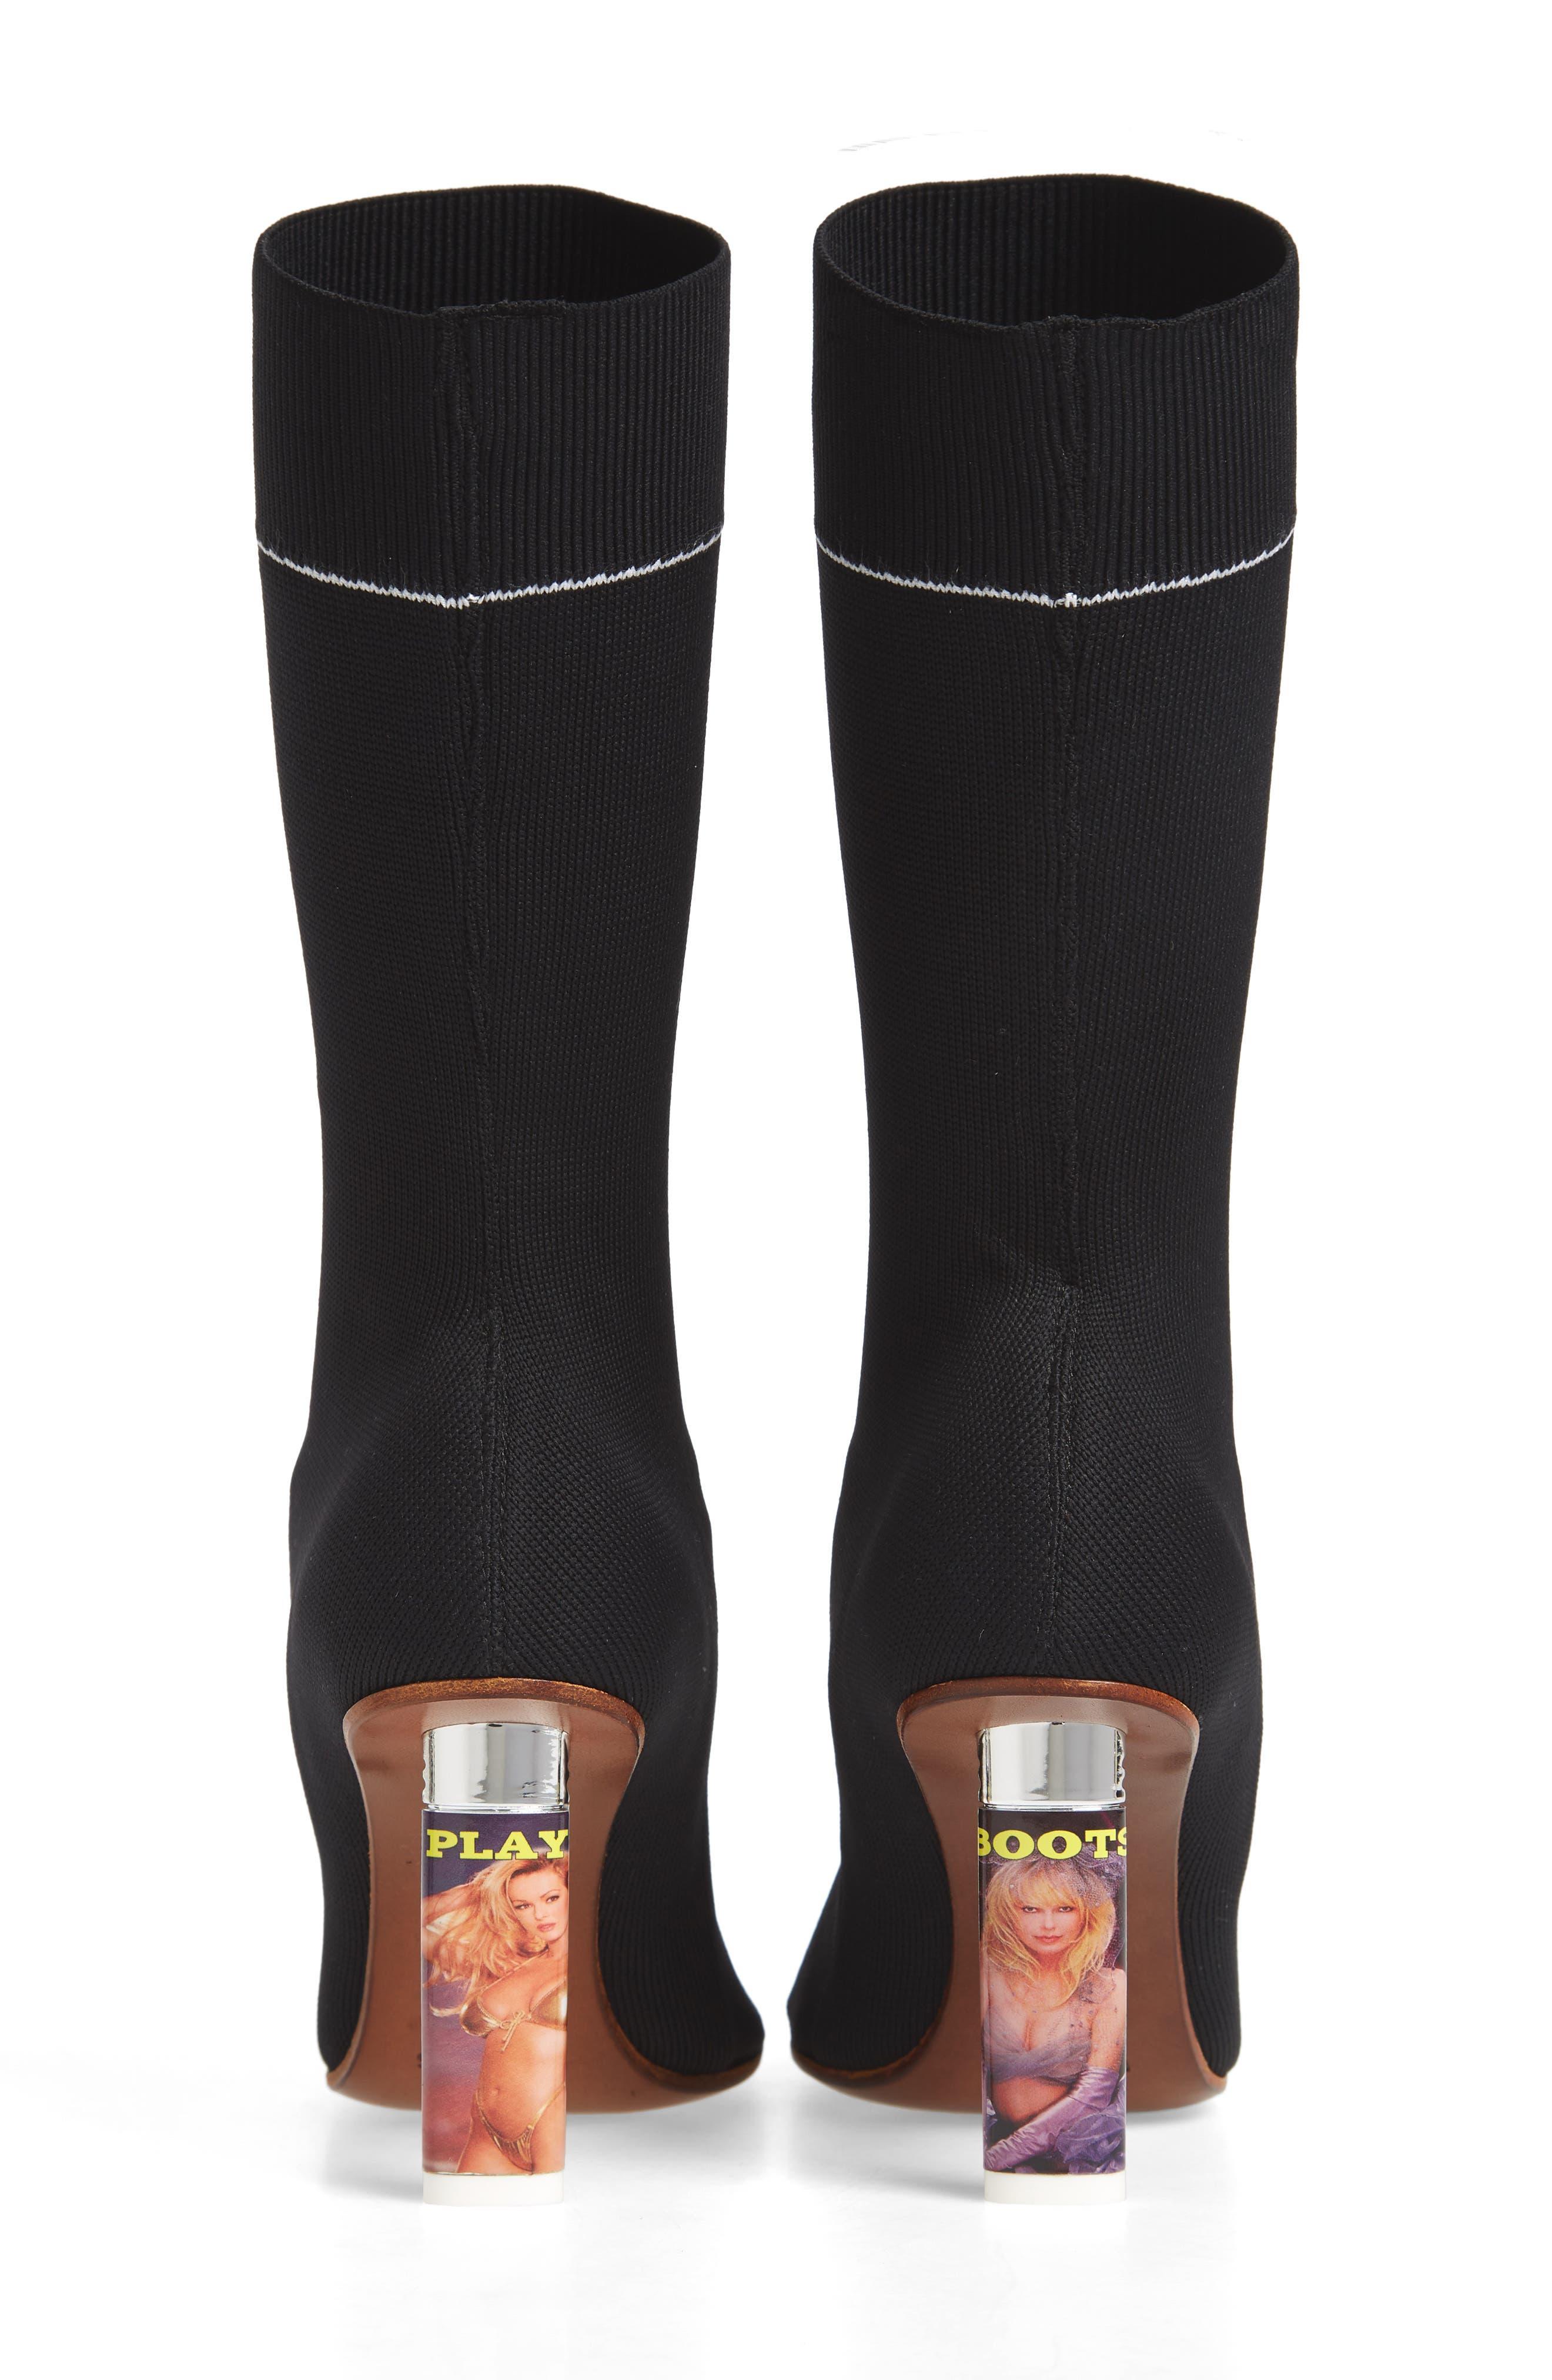 Lighter Sock Boot,                             Alternate thumbnail 7, color,                             Black/Printed Heel